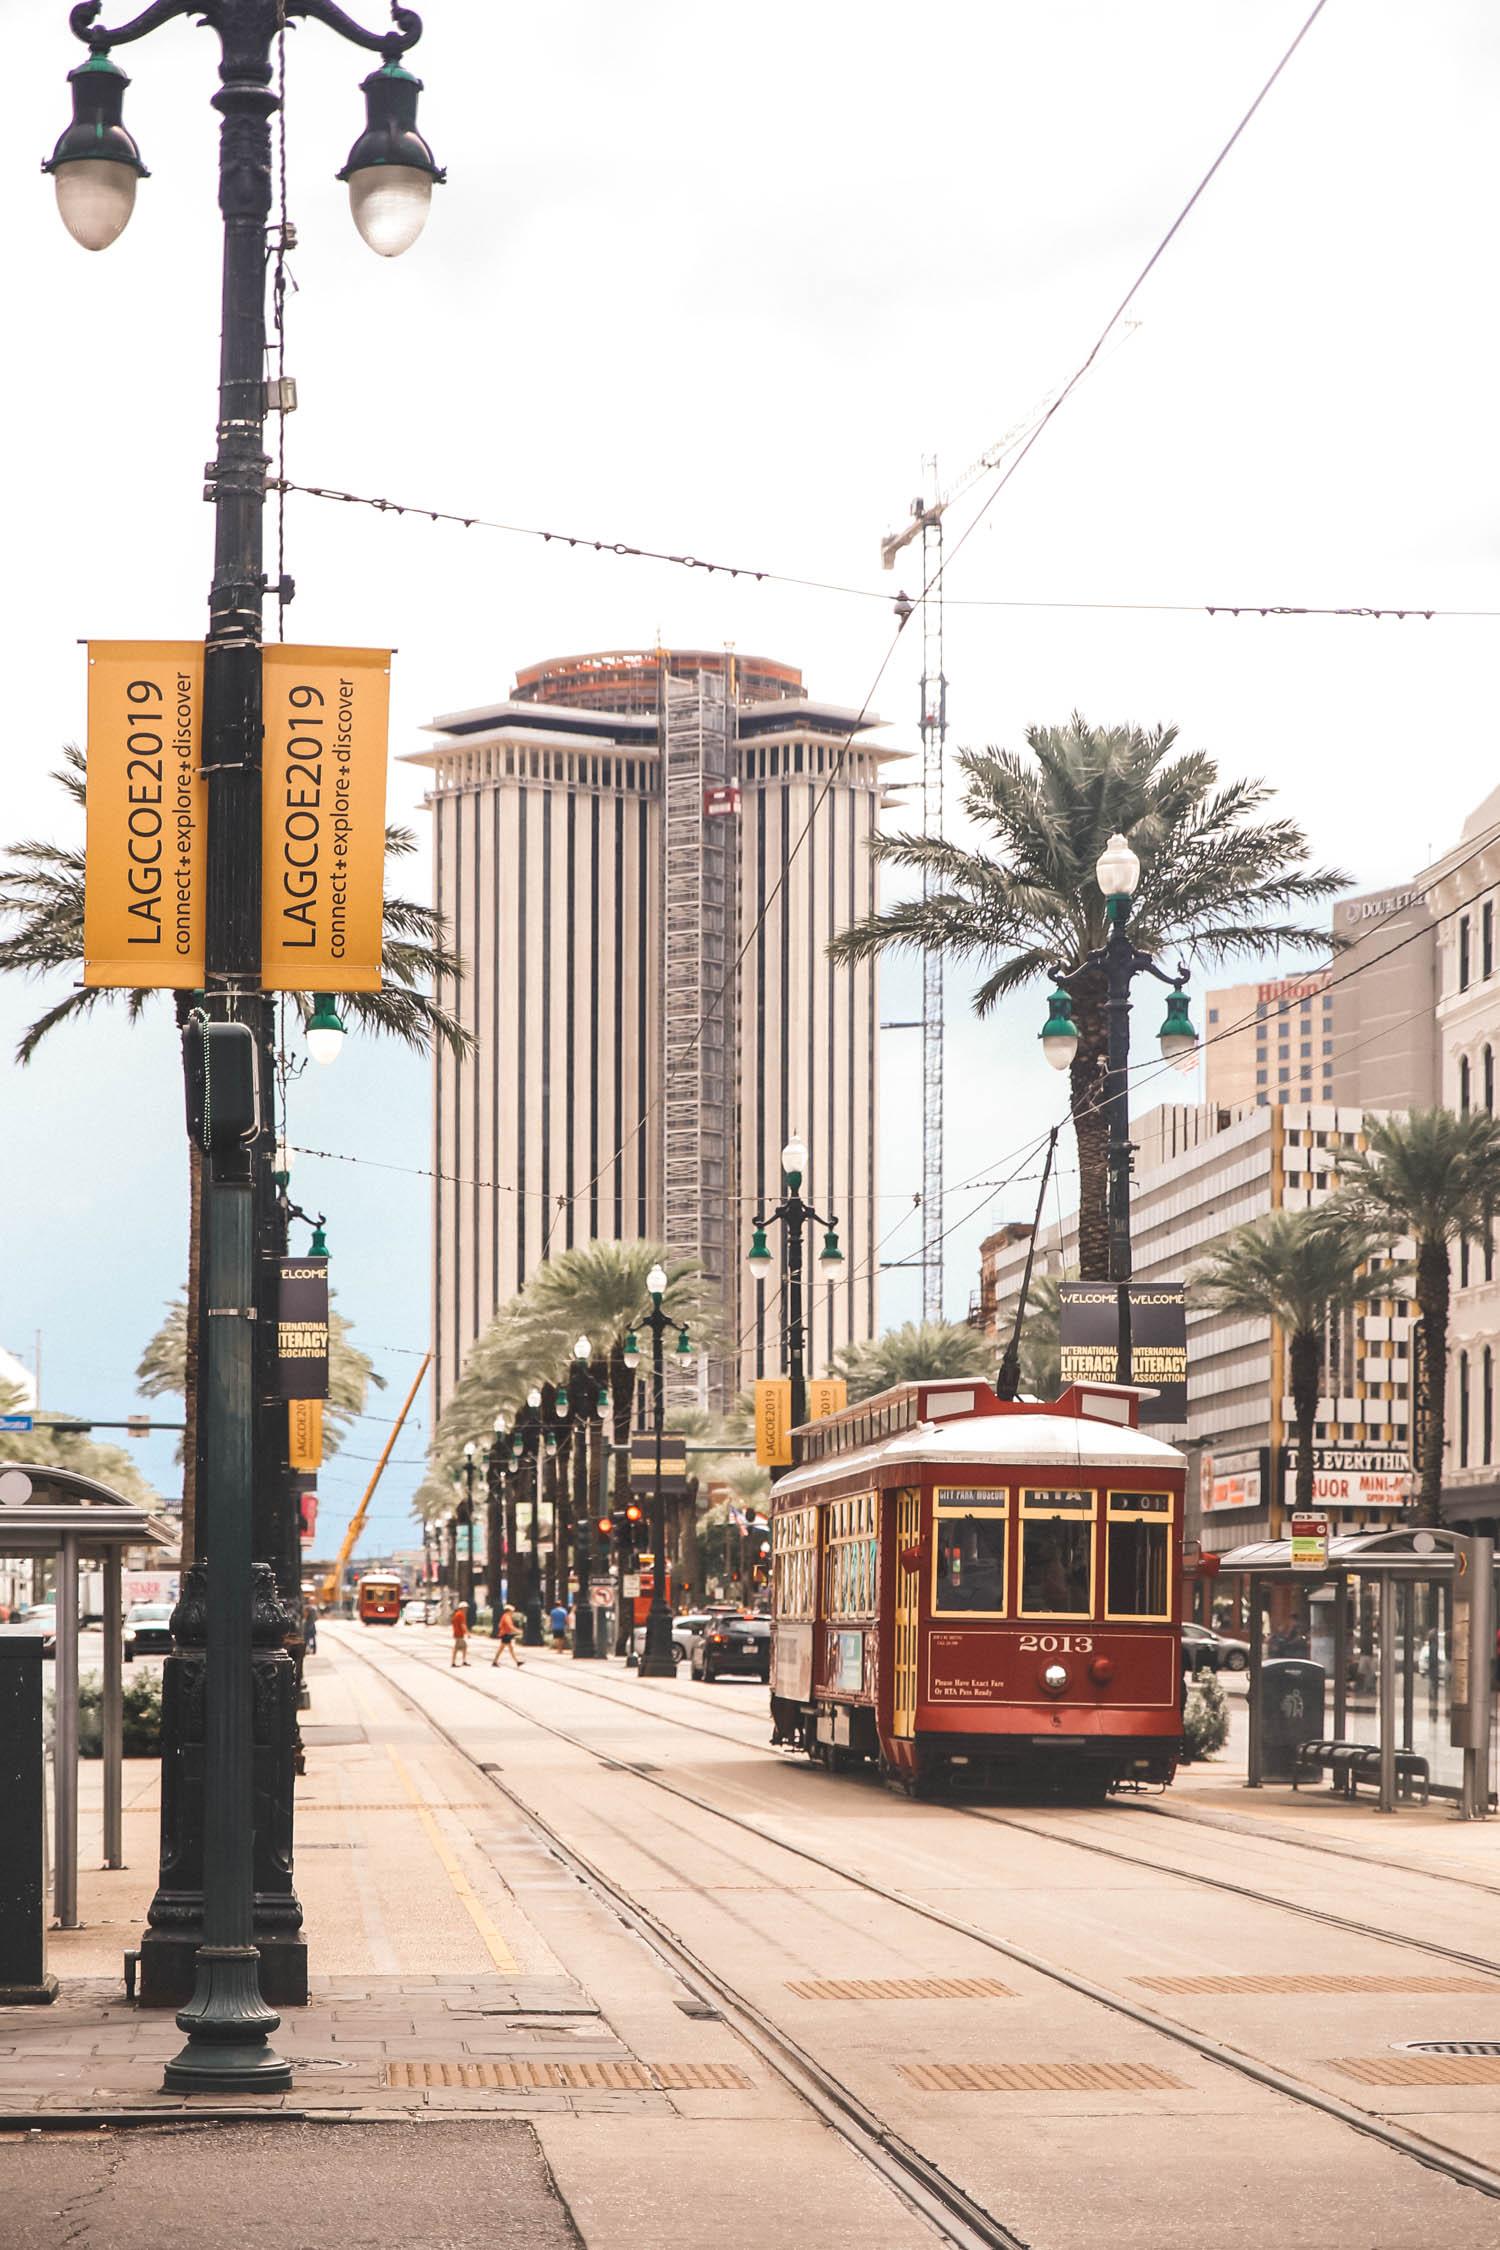 New Orleans Louisiana streetcar